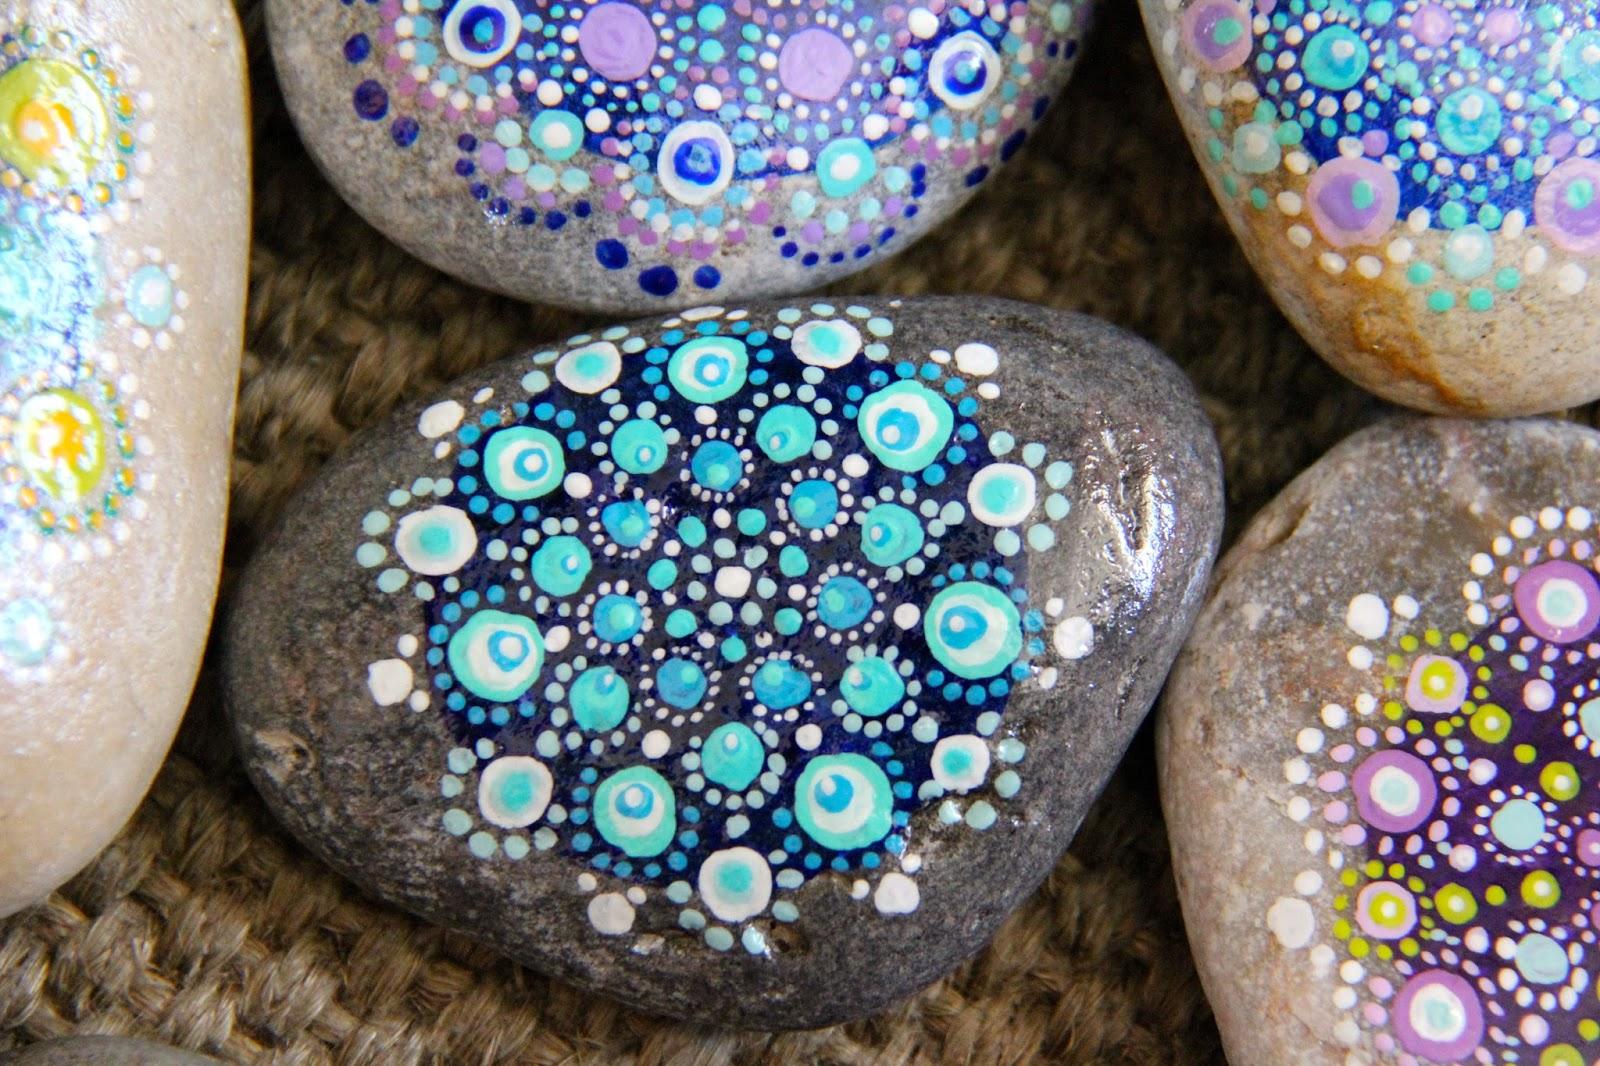 Piedras pintadas una idea original para decorar tu casa - Piedra para decorar ...